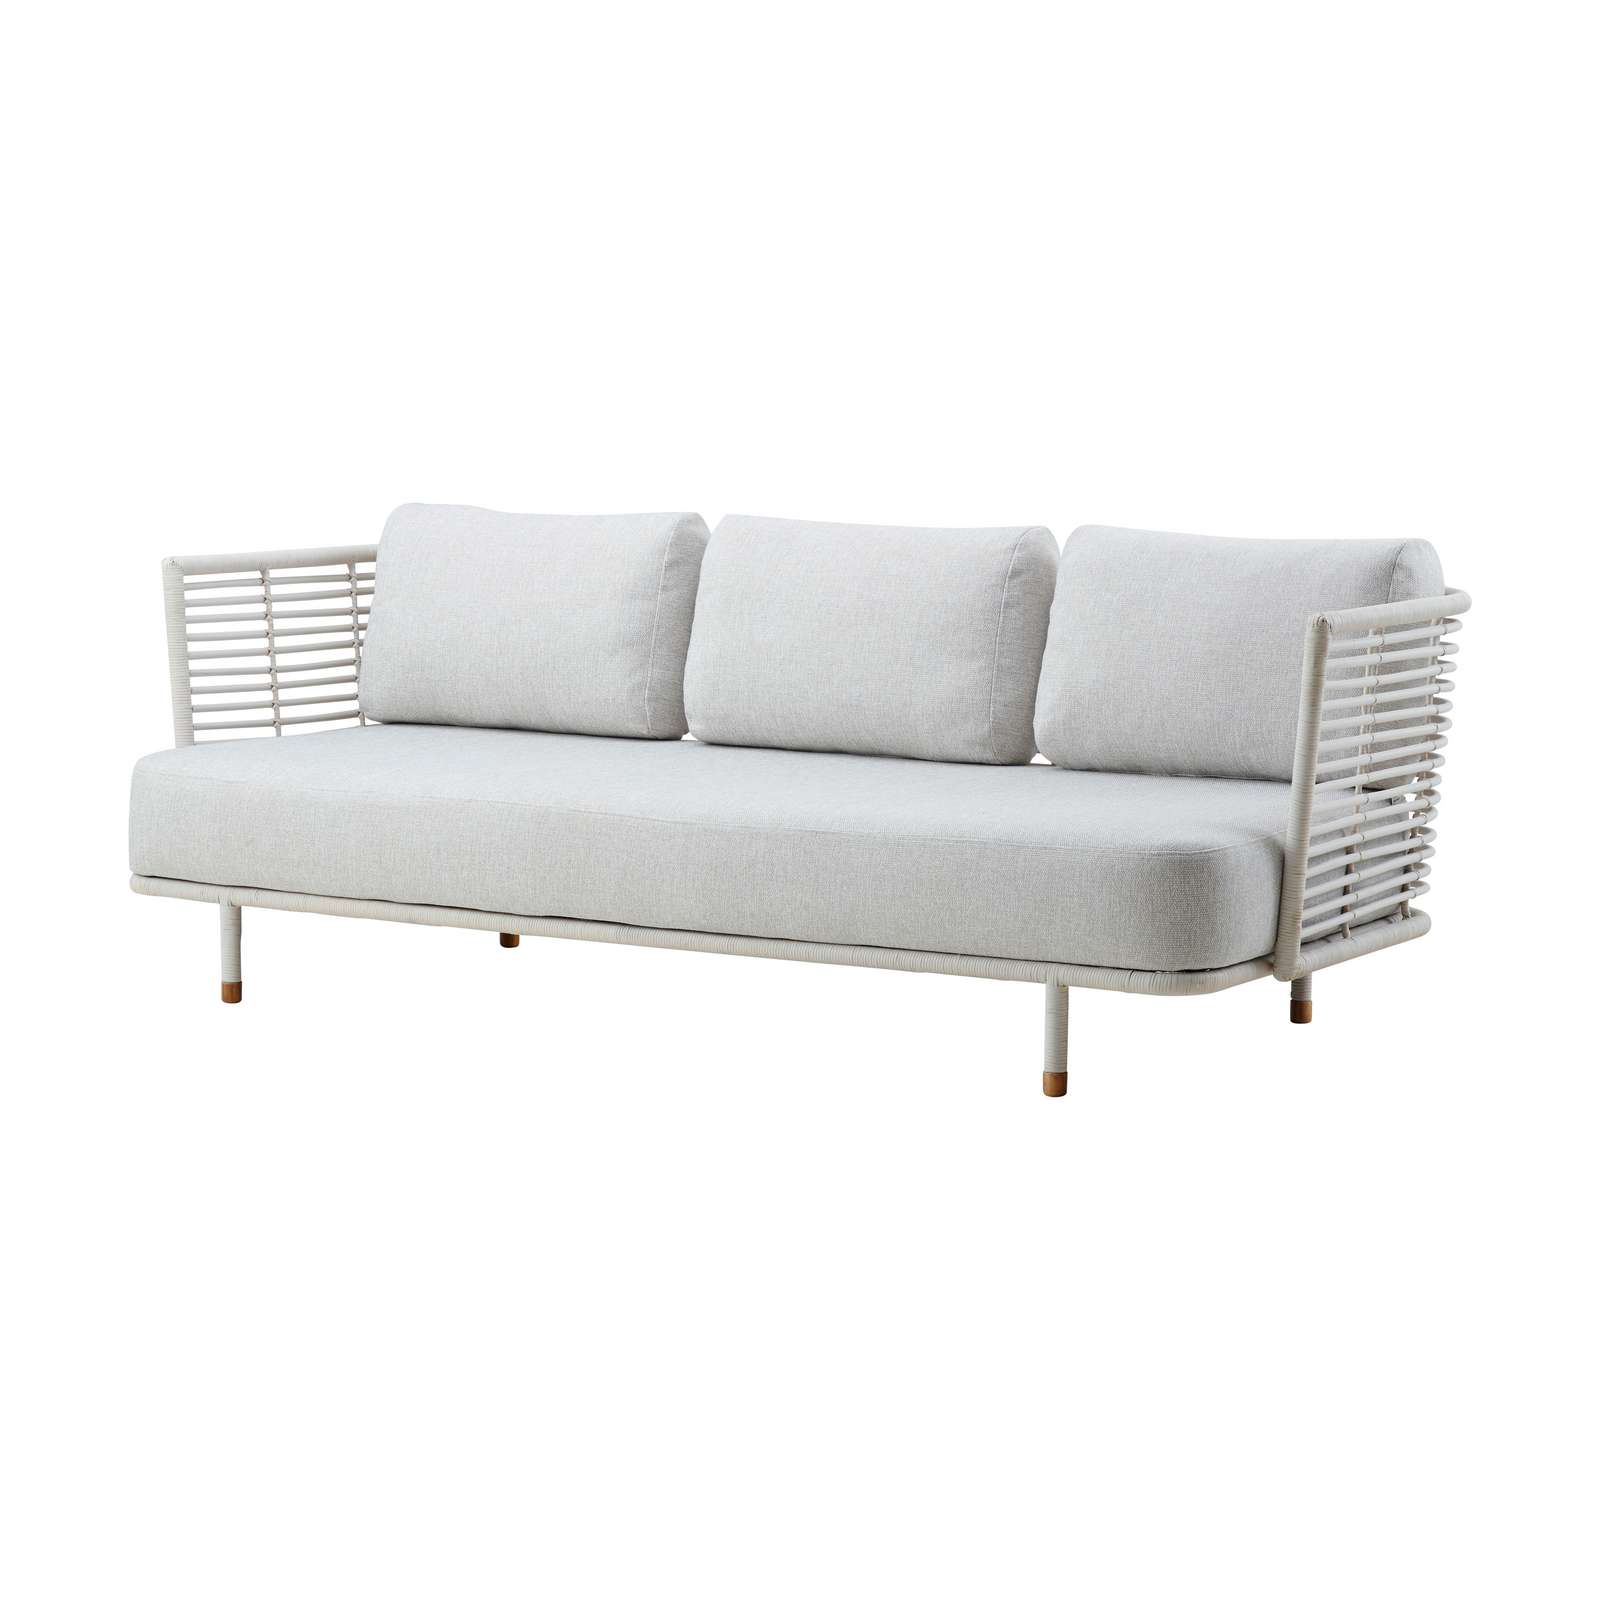 Sense 3 pers soffa vit/grå rotting, Cane-line